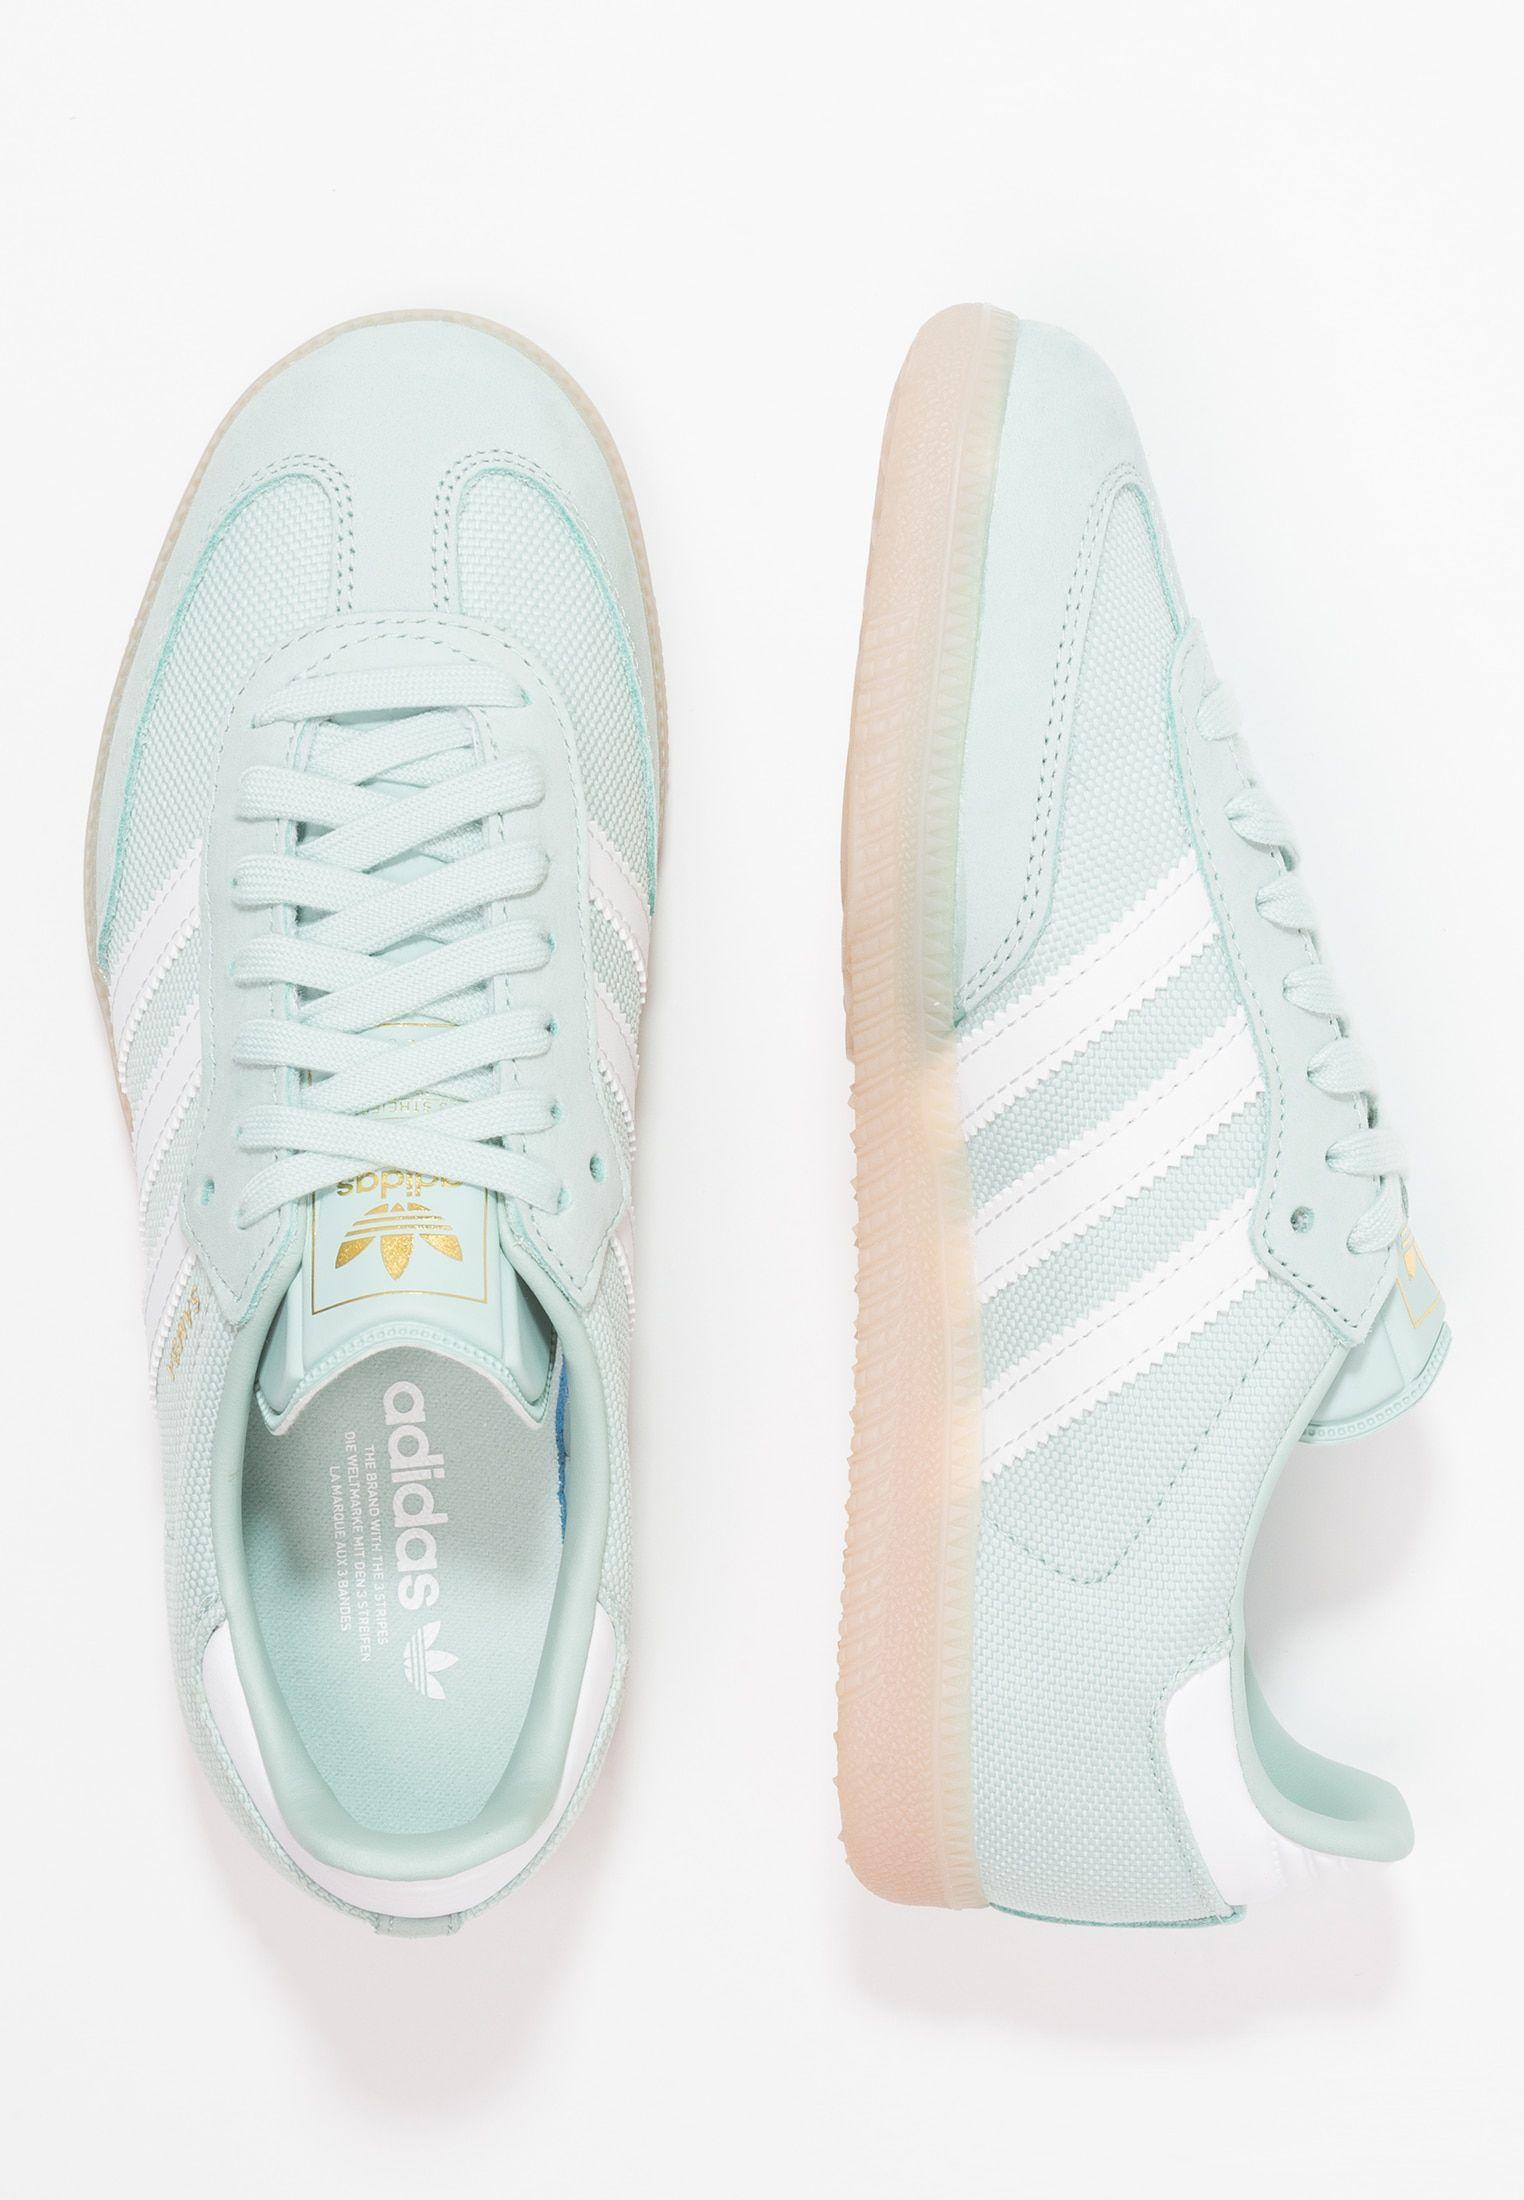 Originals Ash Chaussures Basses Baskets Samba Adidas Greencry fFxw5qgxz